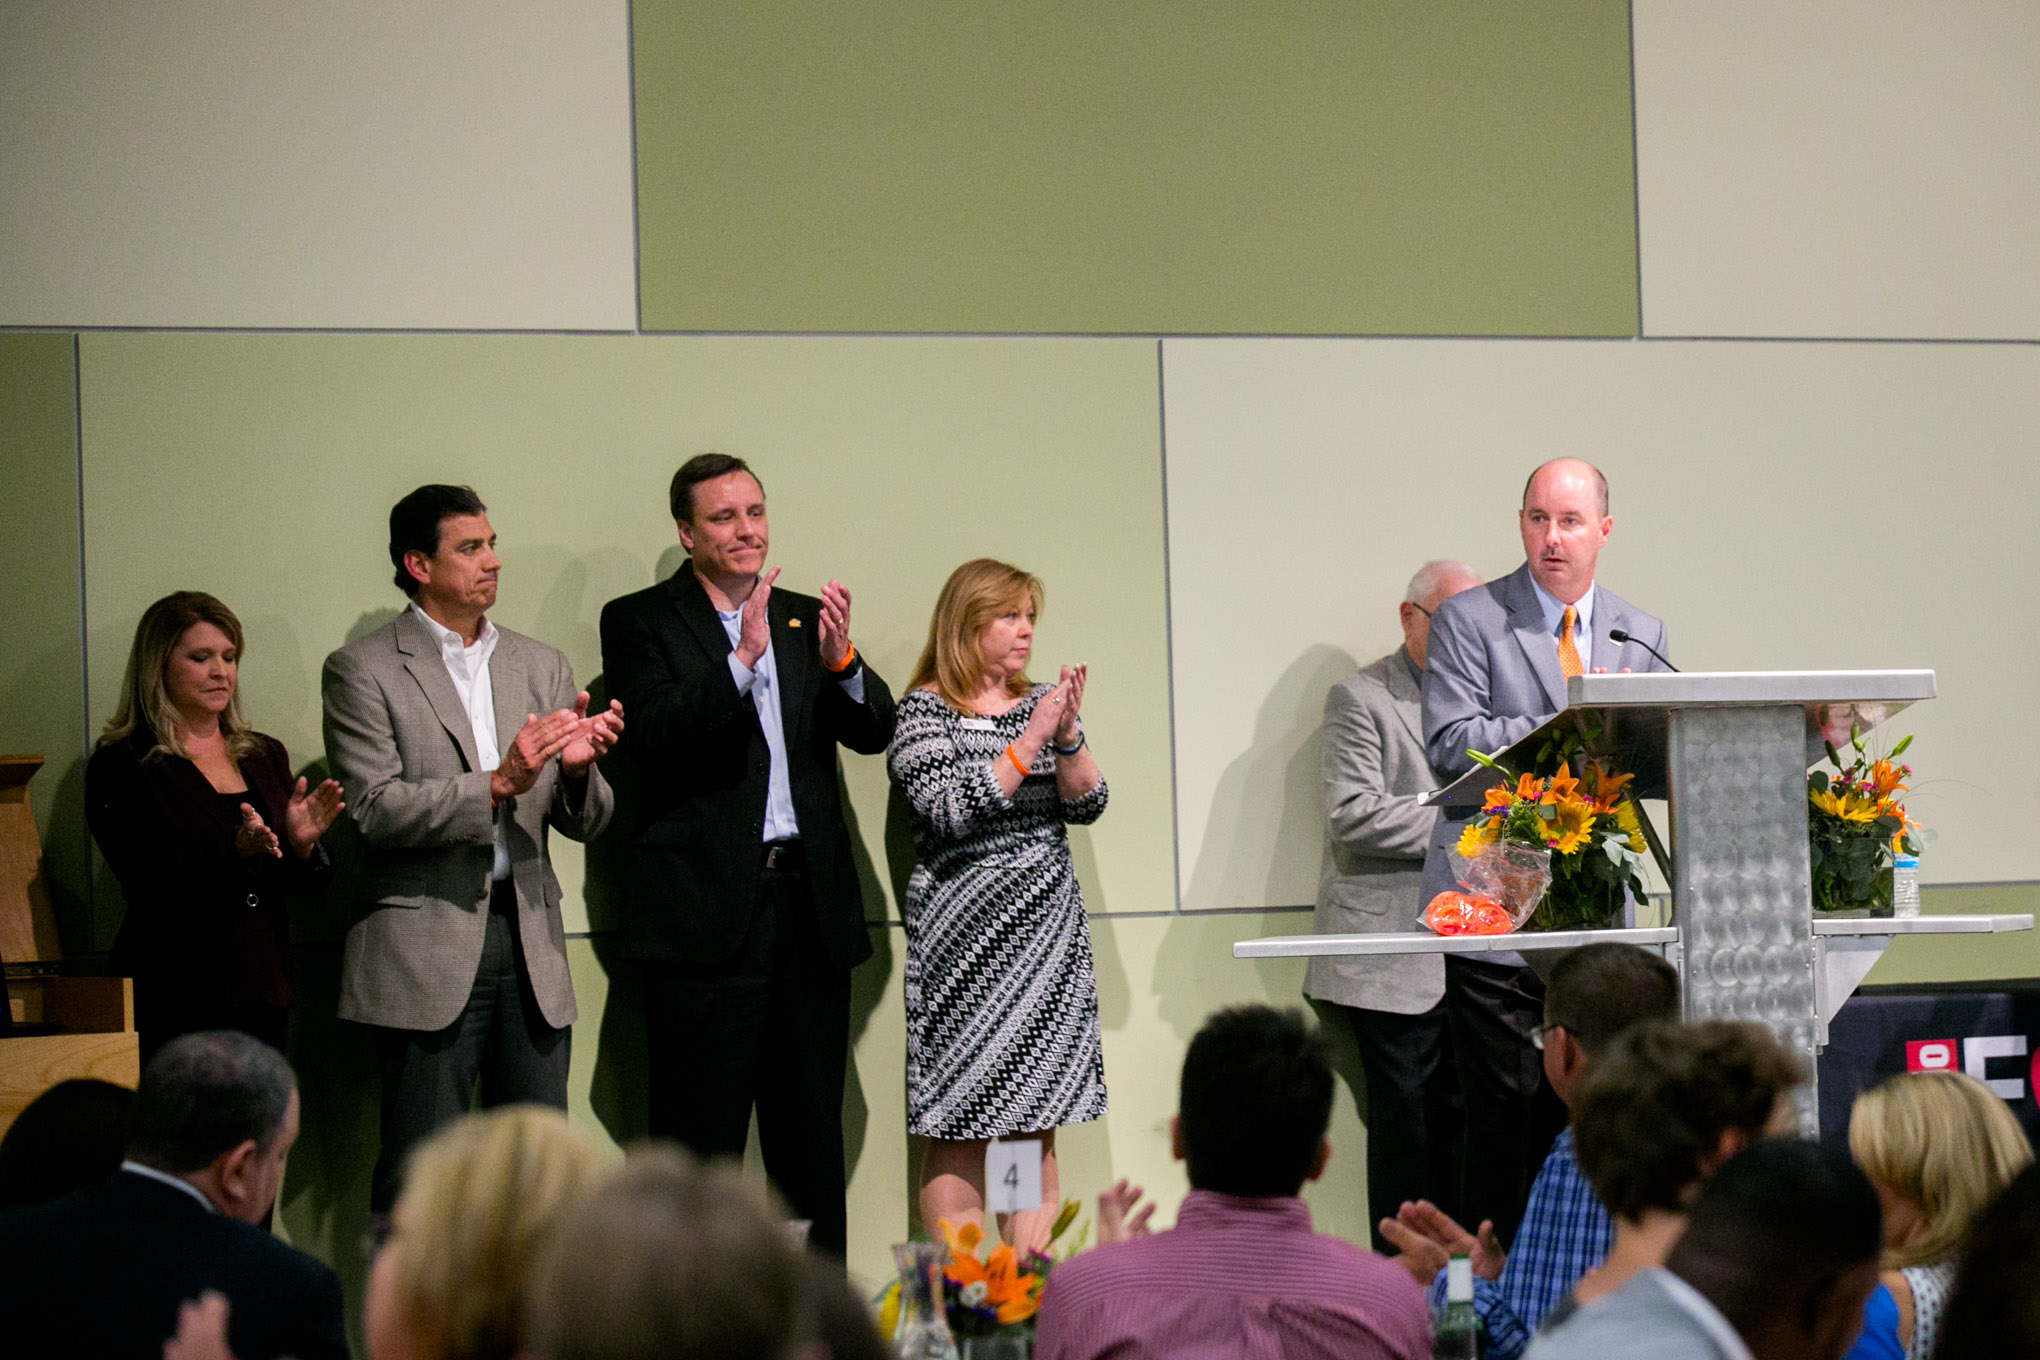 The new 2016 San Antonio Food Bank Board Members. Photo by Kathryn Boyd-Batstone.